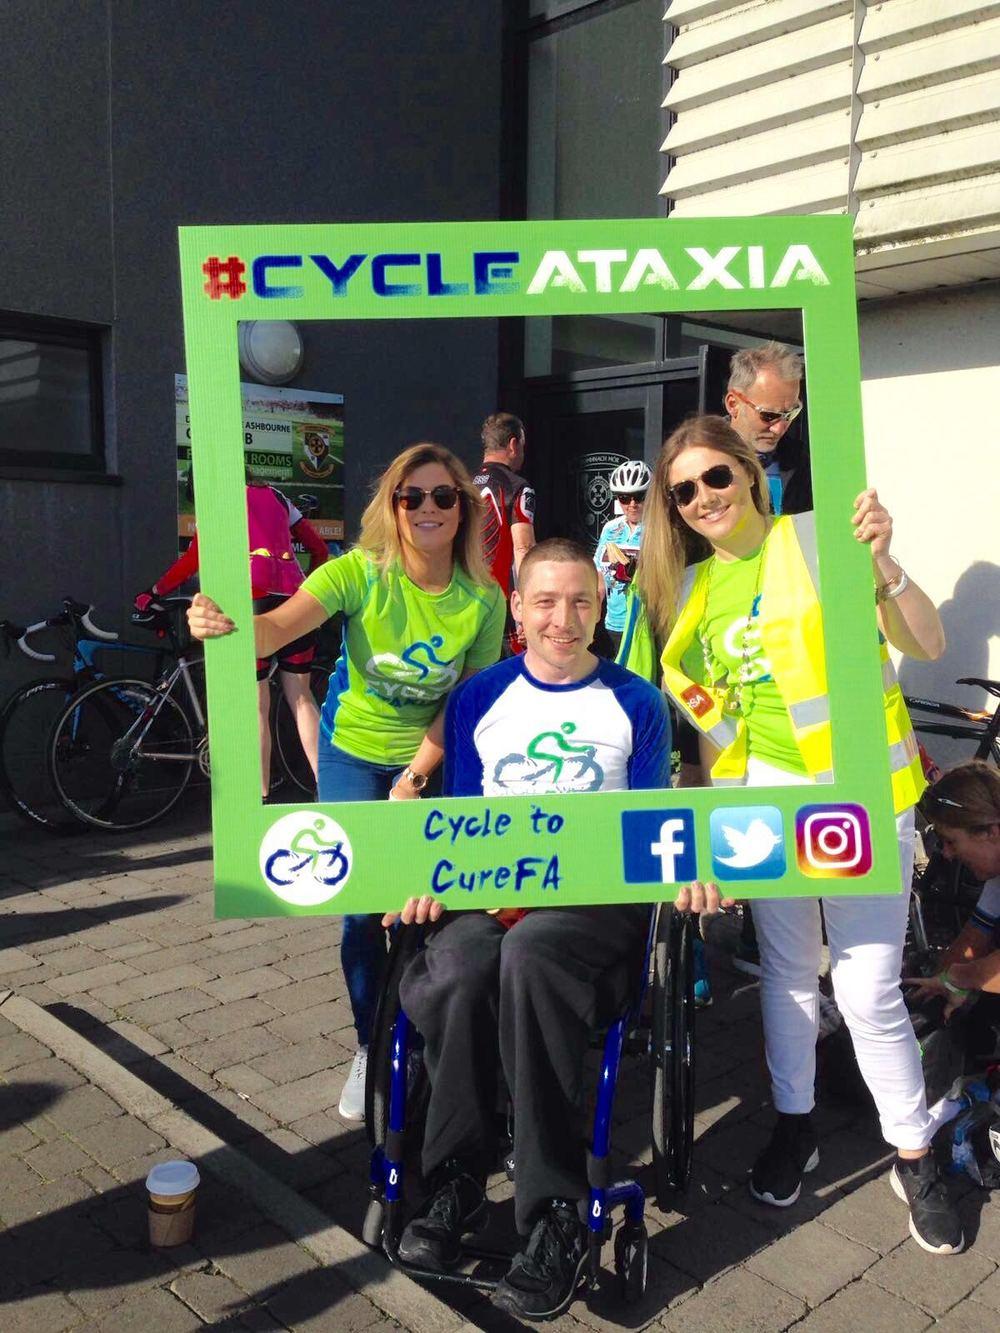 Cycle Ataxia Venue (13).JPG